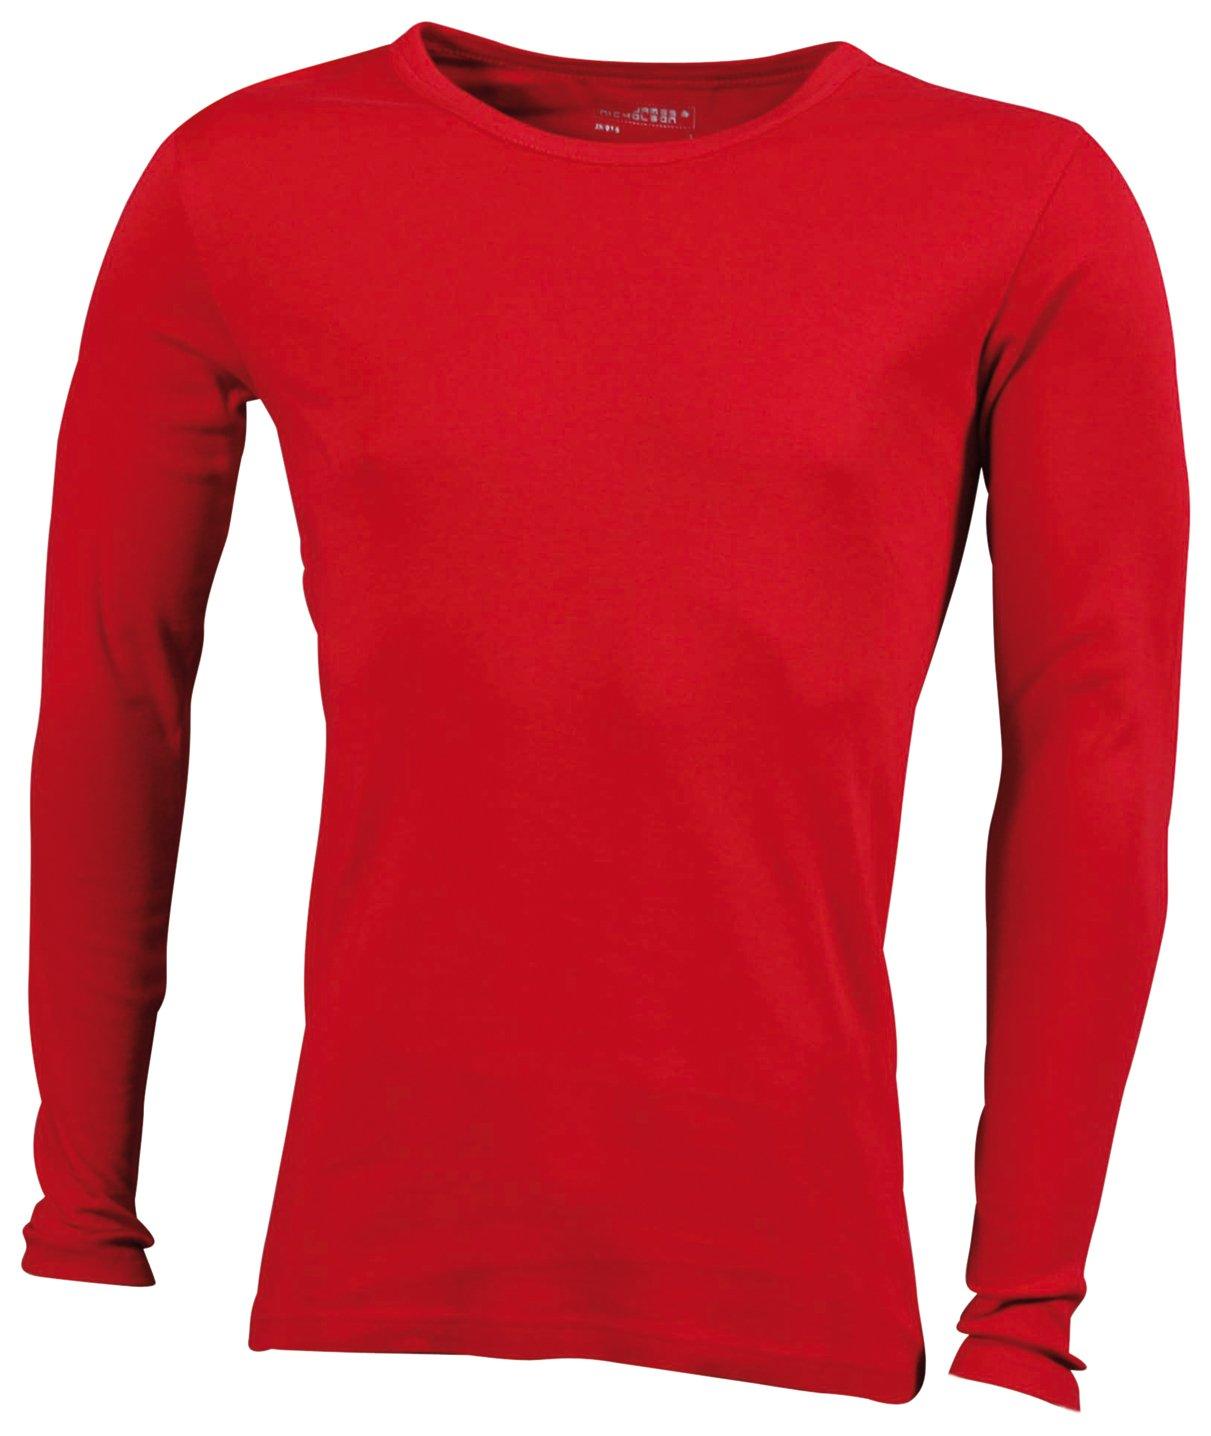 James & Nicholson Herren Langarmshirt Shirt Longsleeve: Amazon.de:  Bekleidung